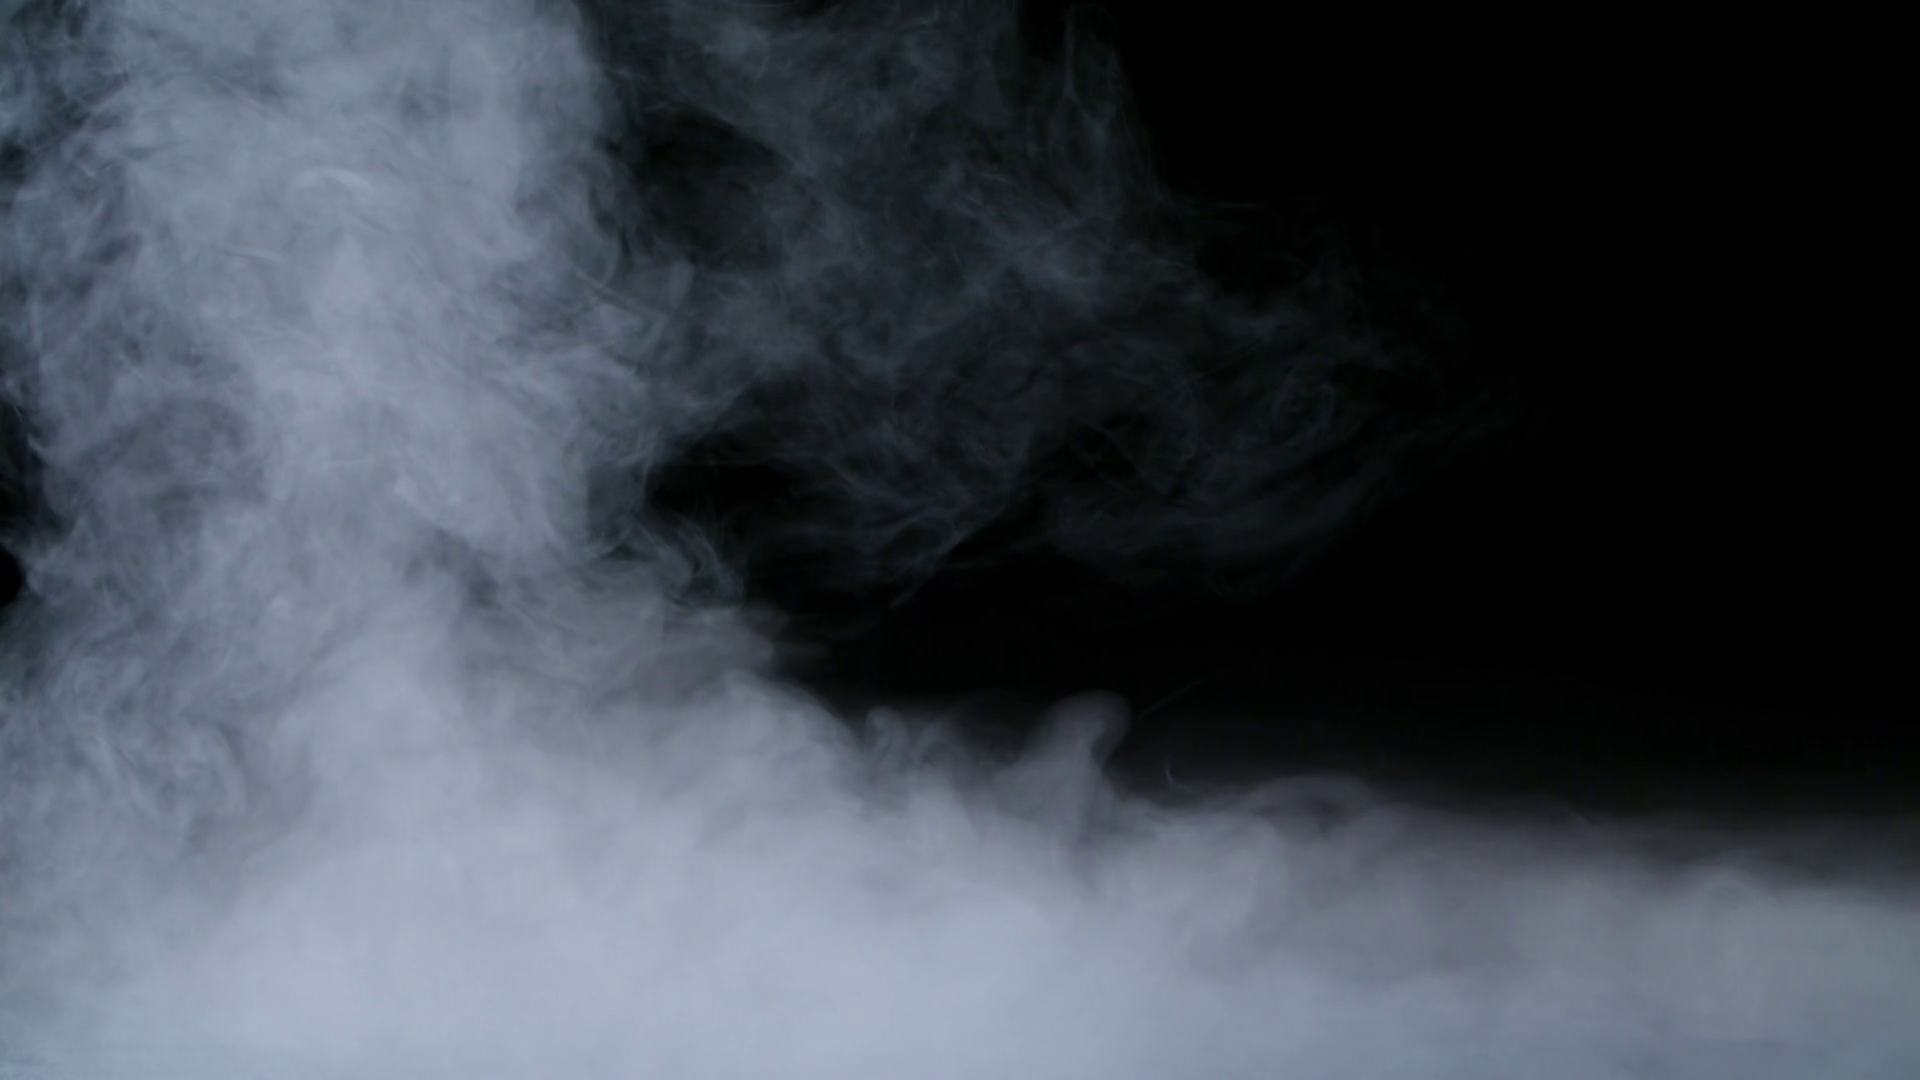 free fog and smoke overlays for photoshop